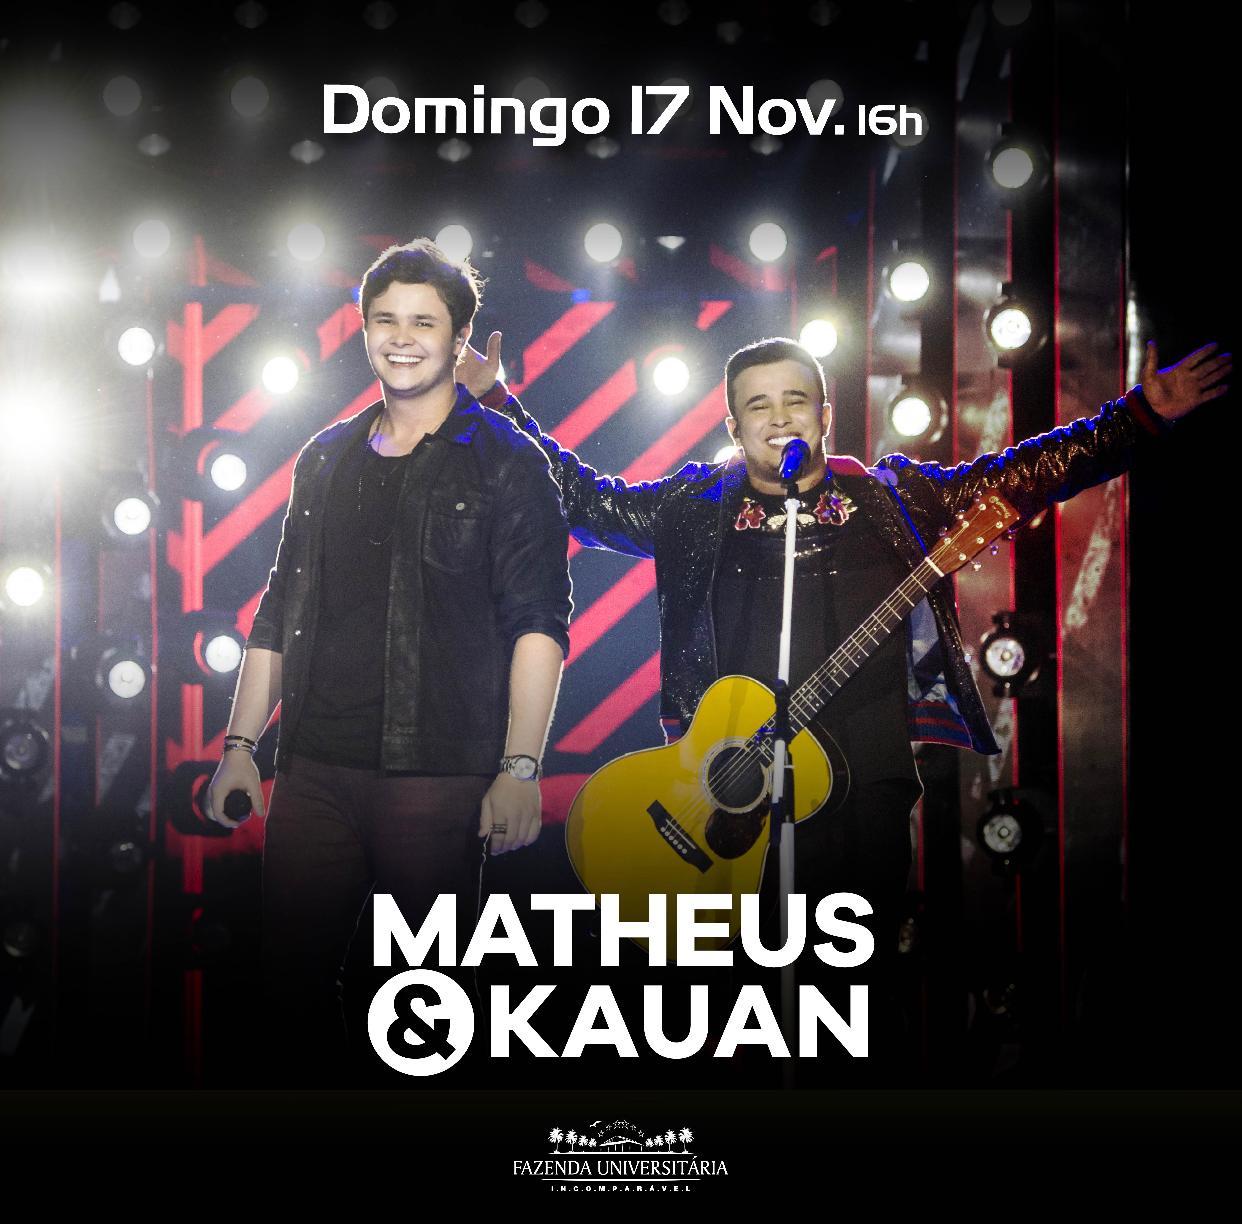 Matheus & Kauan - Fazenda Universitária - 17/11/19 - Suzano - SP